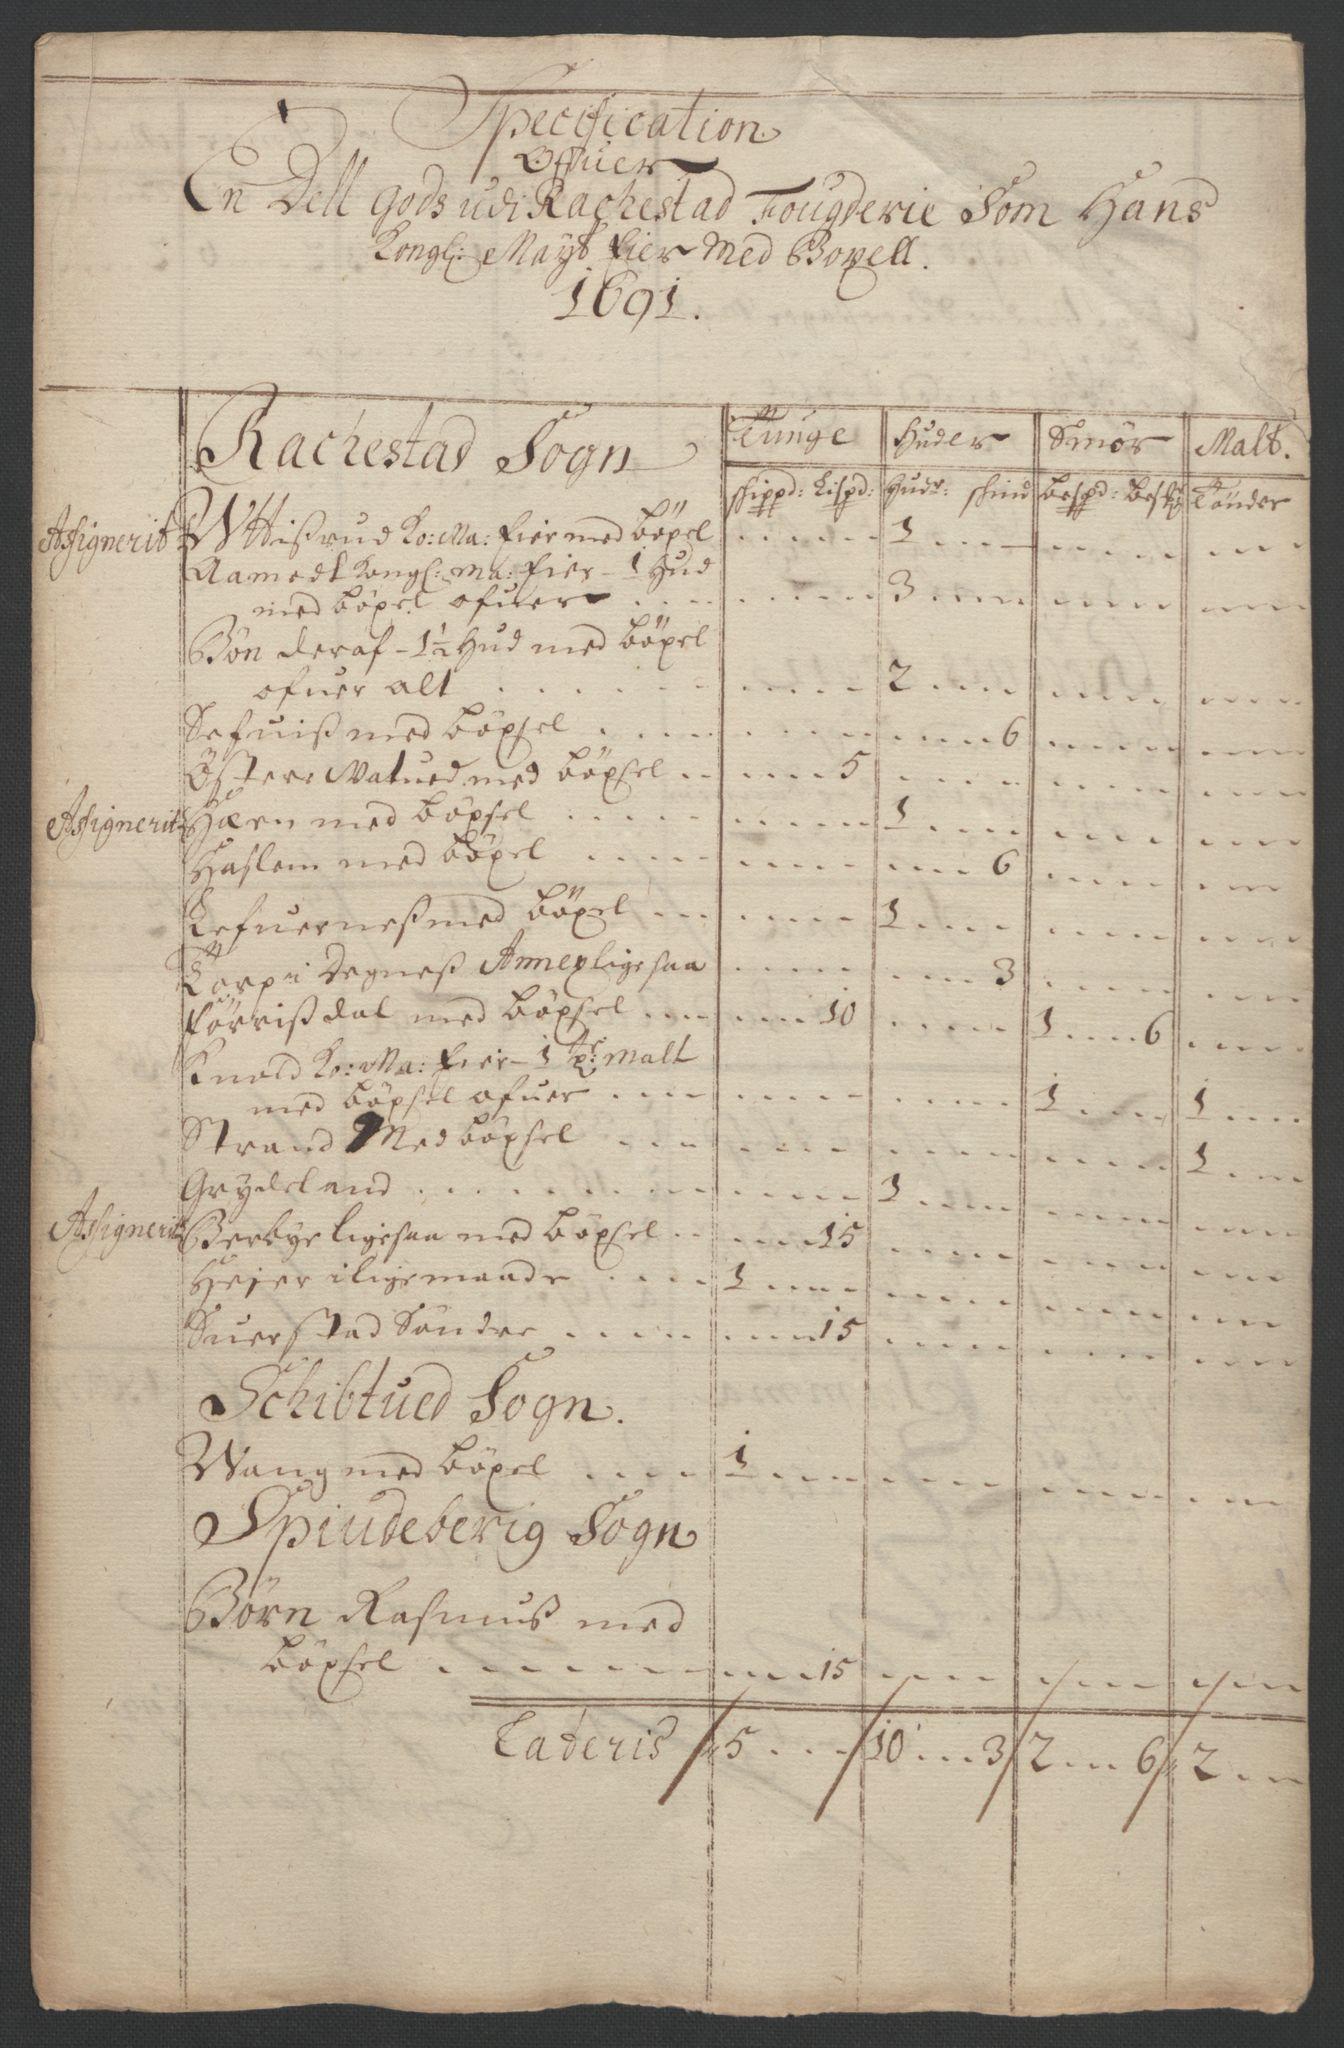 RA, Rentekammeret inntil 1814, Reviderte regnskaper, Fogderegnskap, R05/L0278: Fogderegnskap Rakkestad, 1691-1693, s. 13